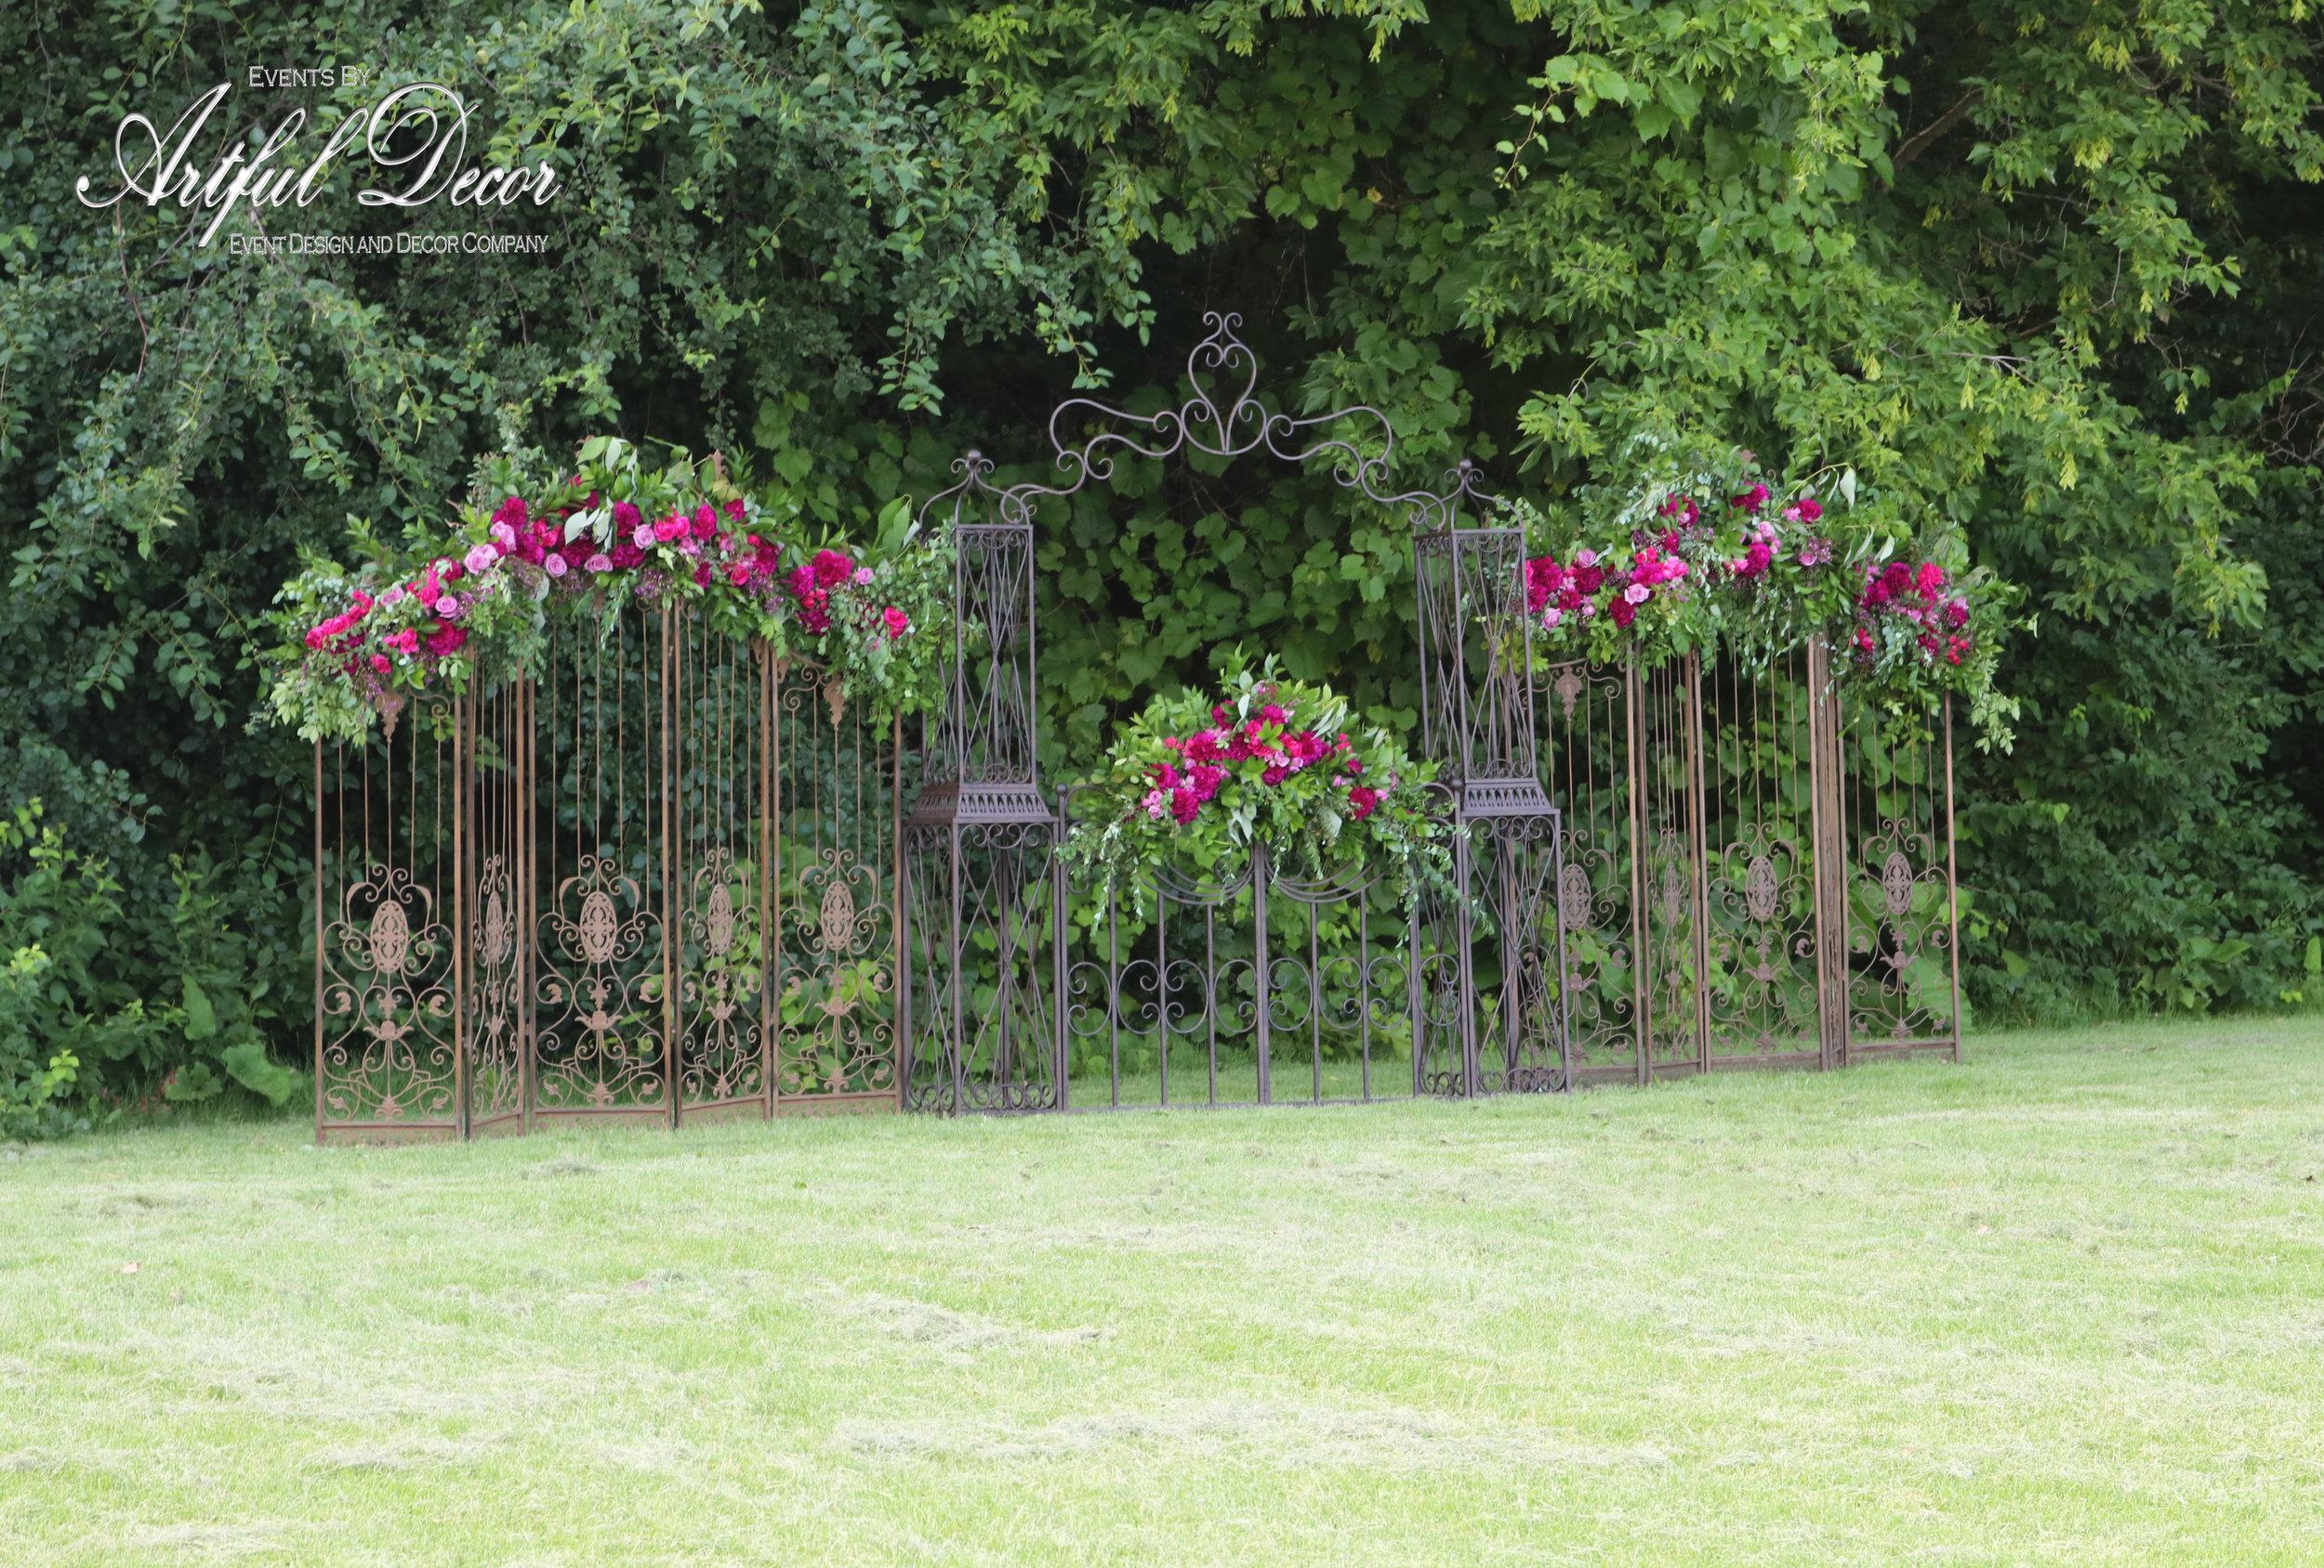 Garden Gate 8 Copyright.jpg